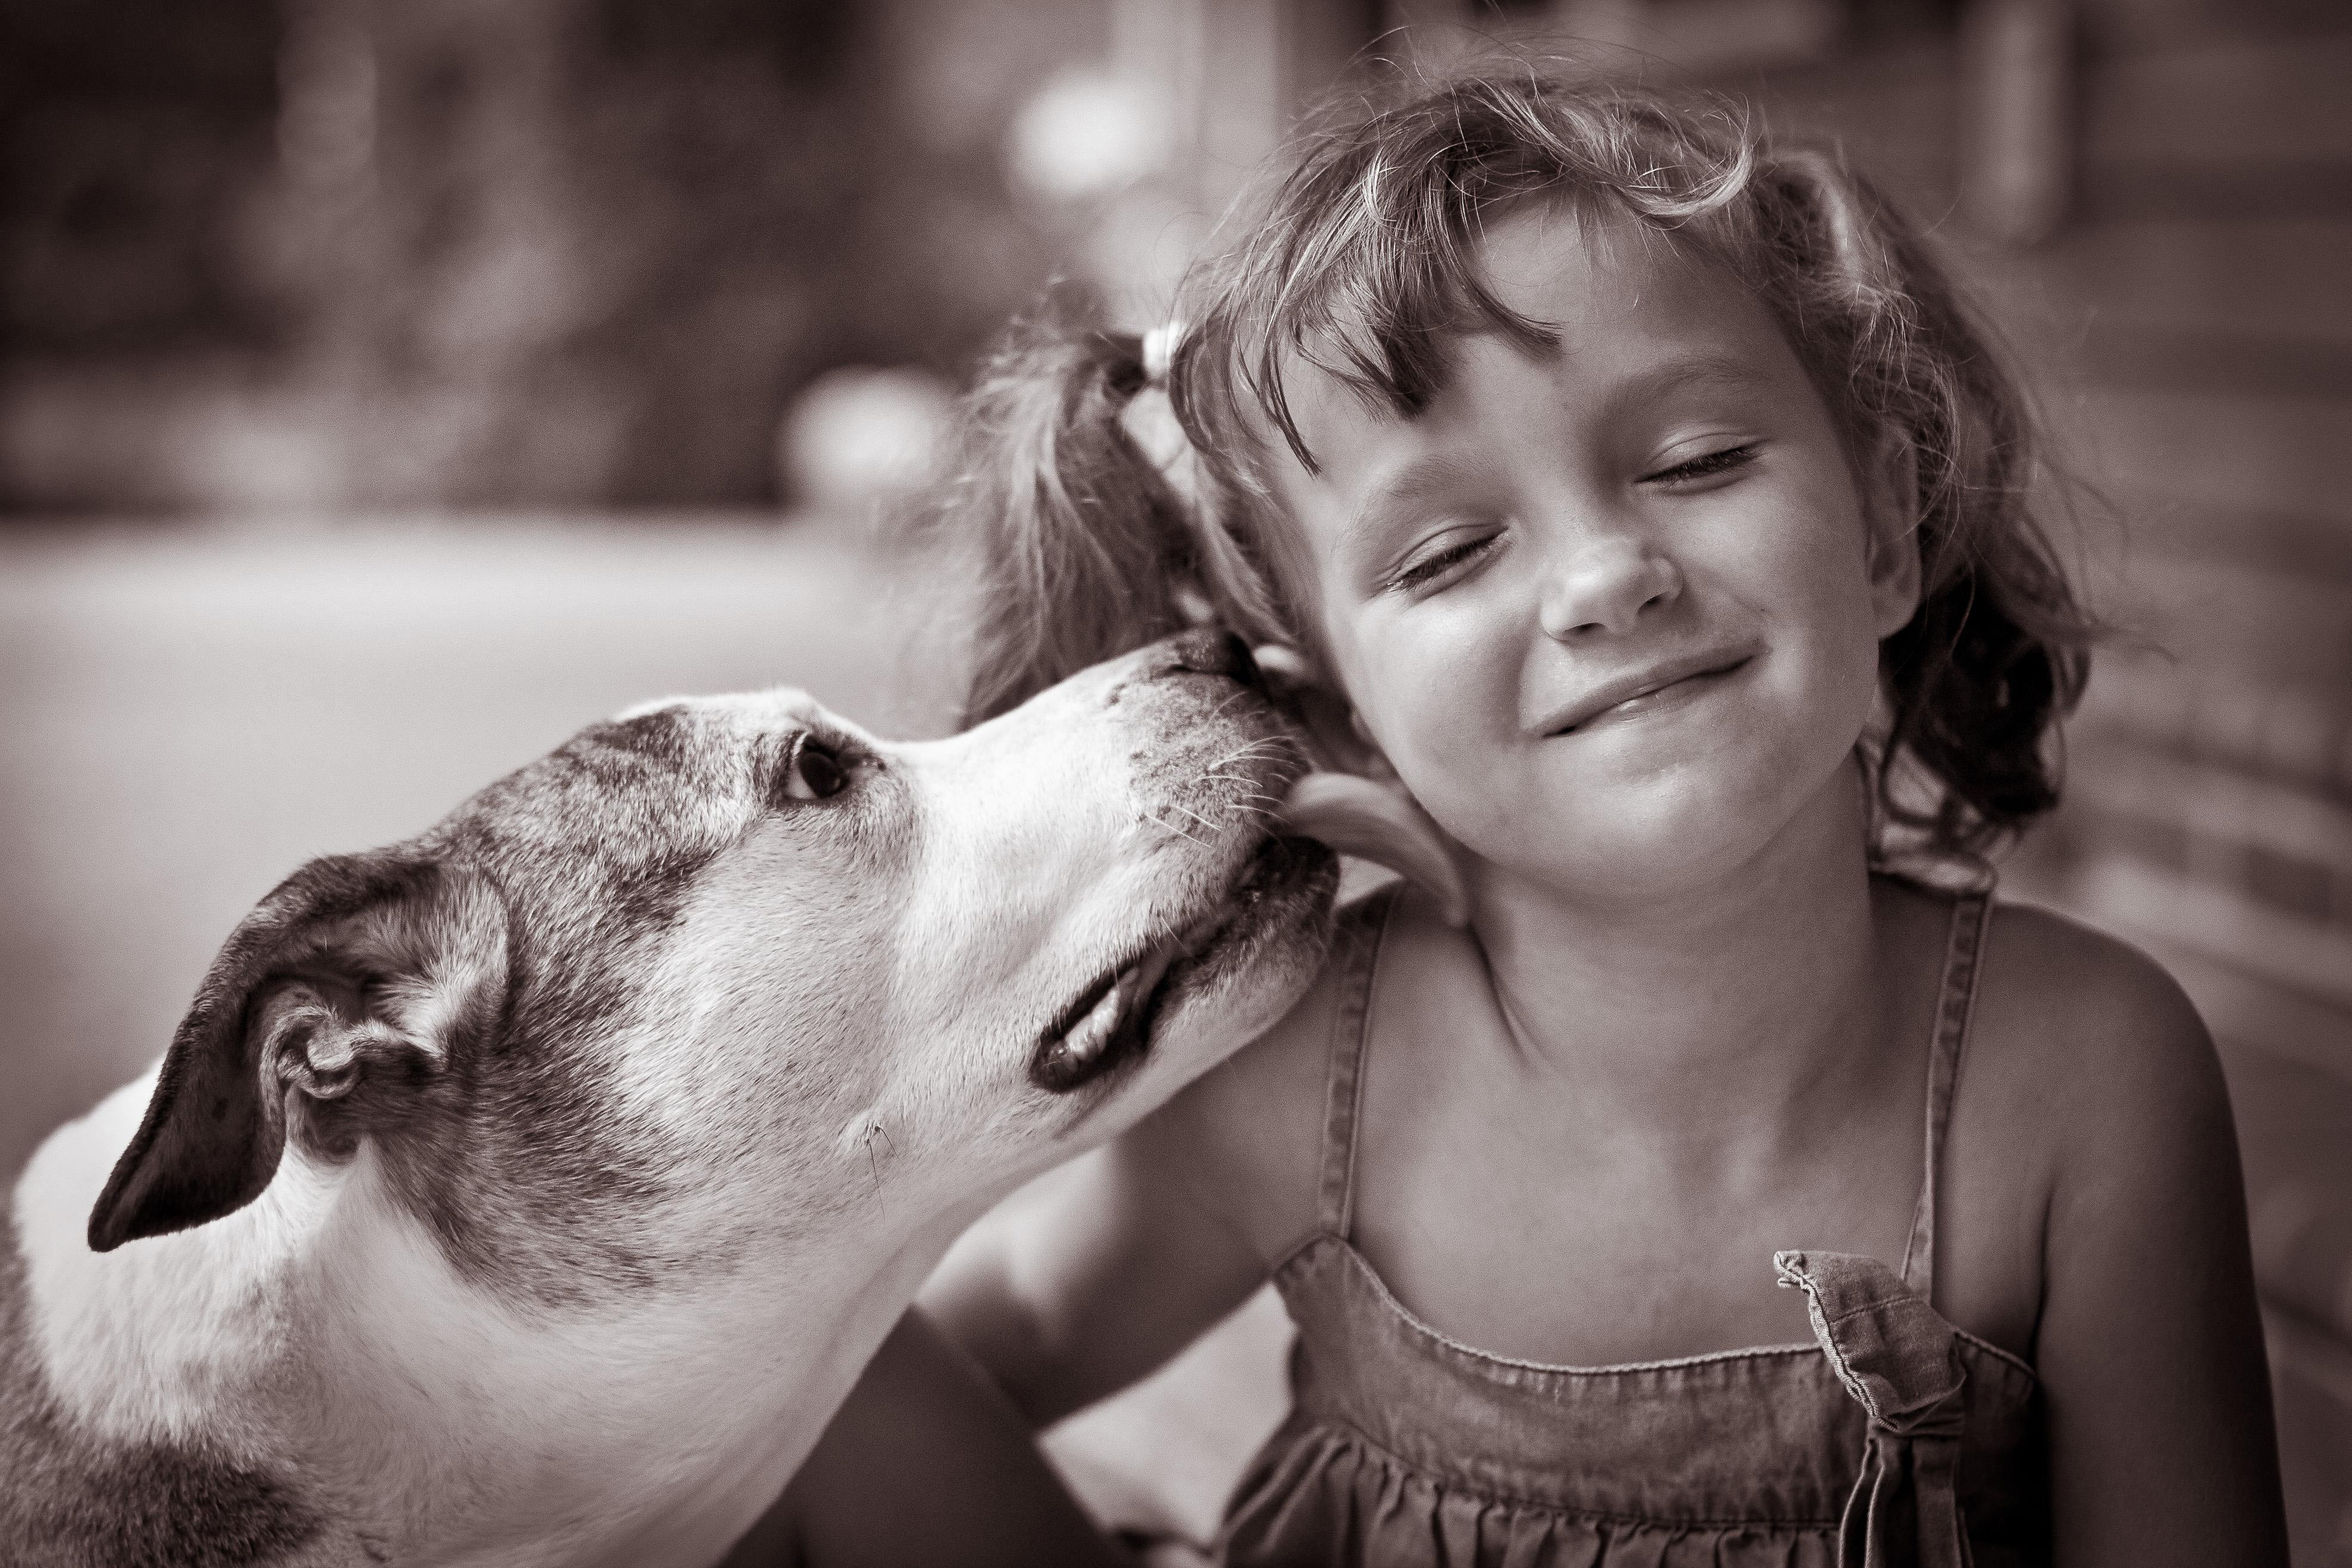 Wallpaper Friends Rescue Love Girl Canon Happy 50mm Virginia Friendship Daughter Pit Richmond Pitbull Va Pigtails Bliss Adopt Bestfriends Adoption Powhatan Specialmoment Flickraward Powhatanva Rememberthatmomentlevel1